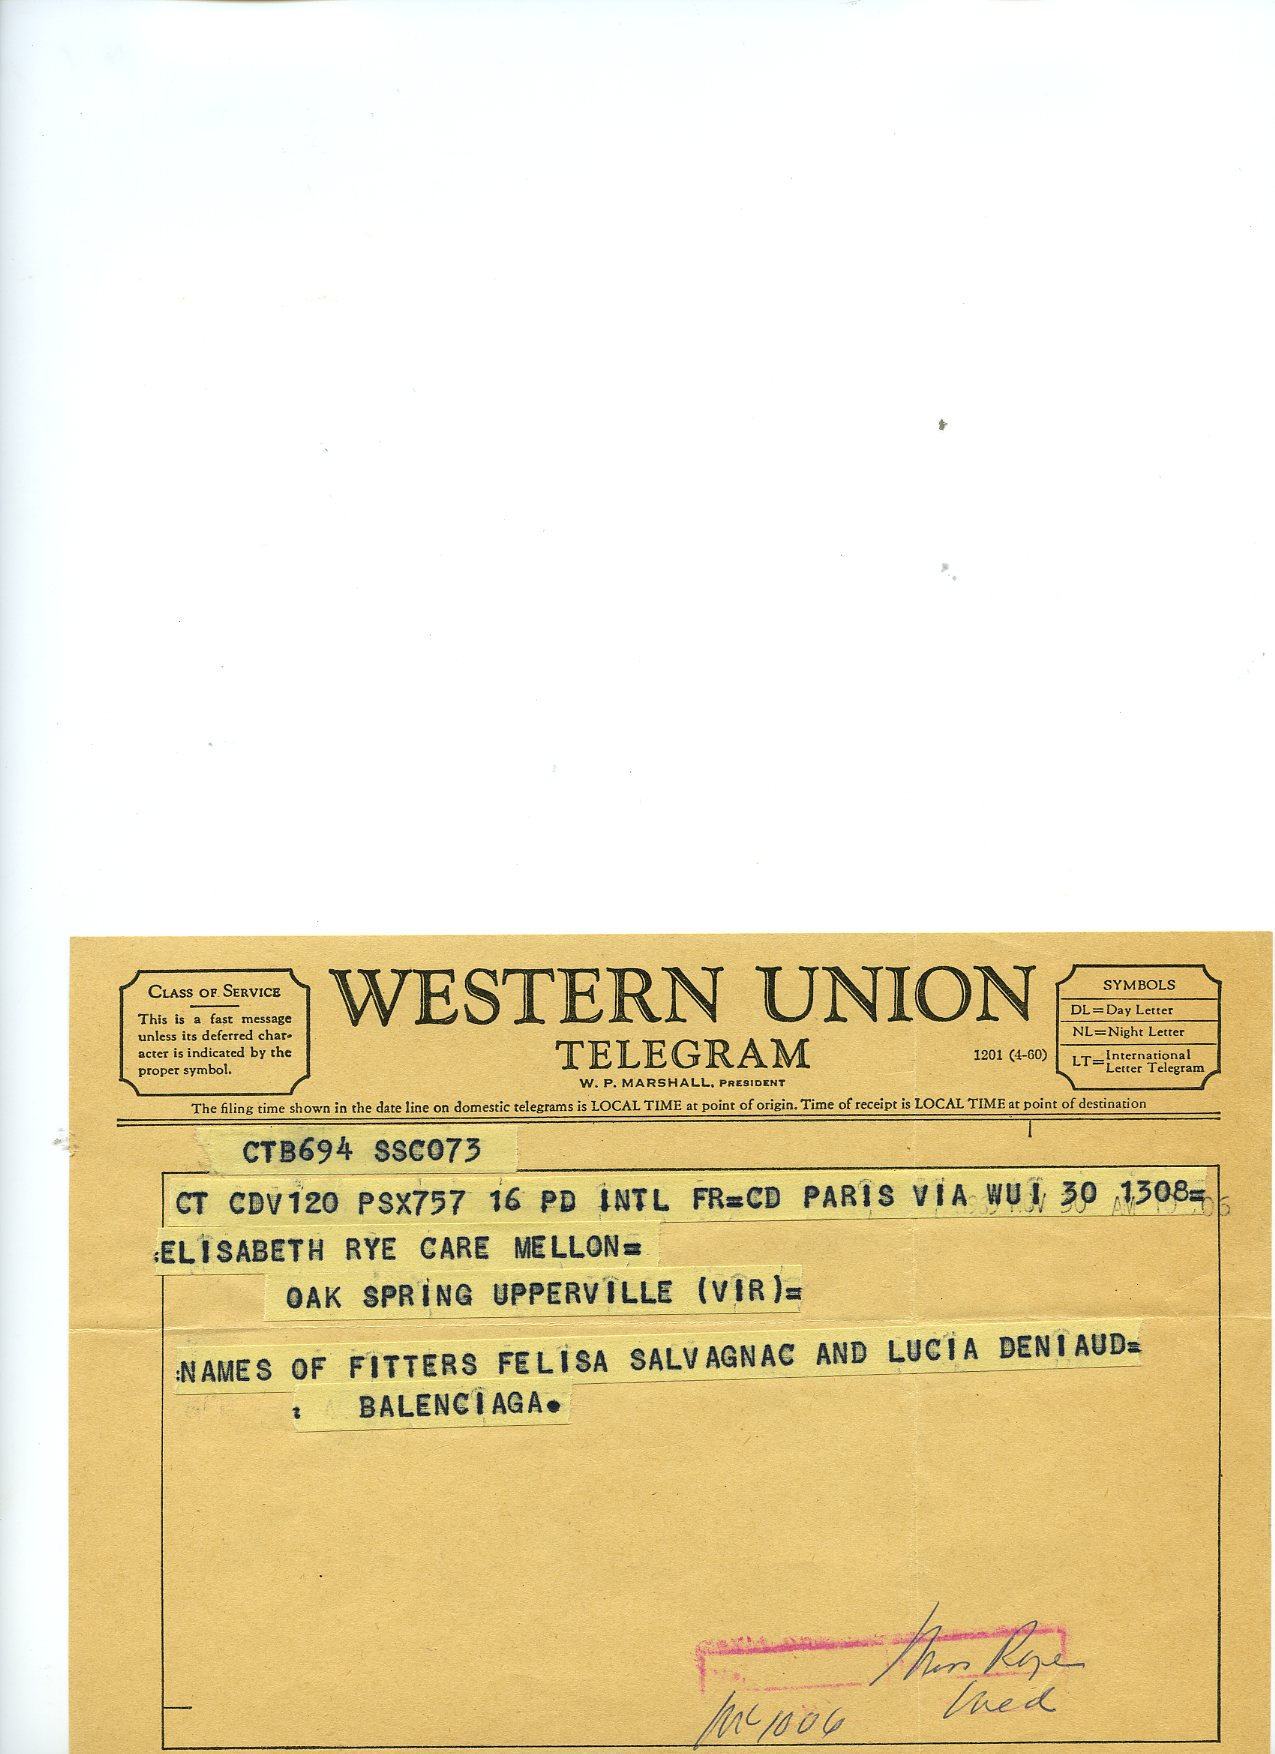 Telegrama dirigido a Elizabeth Rye Care, secretaria de Mrs Mellon, desde Balenciaga